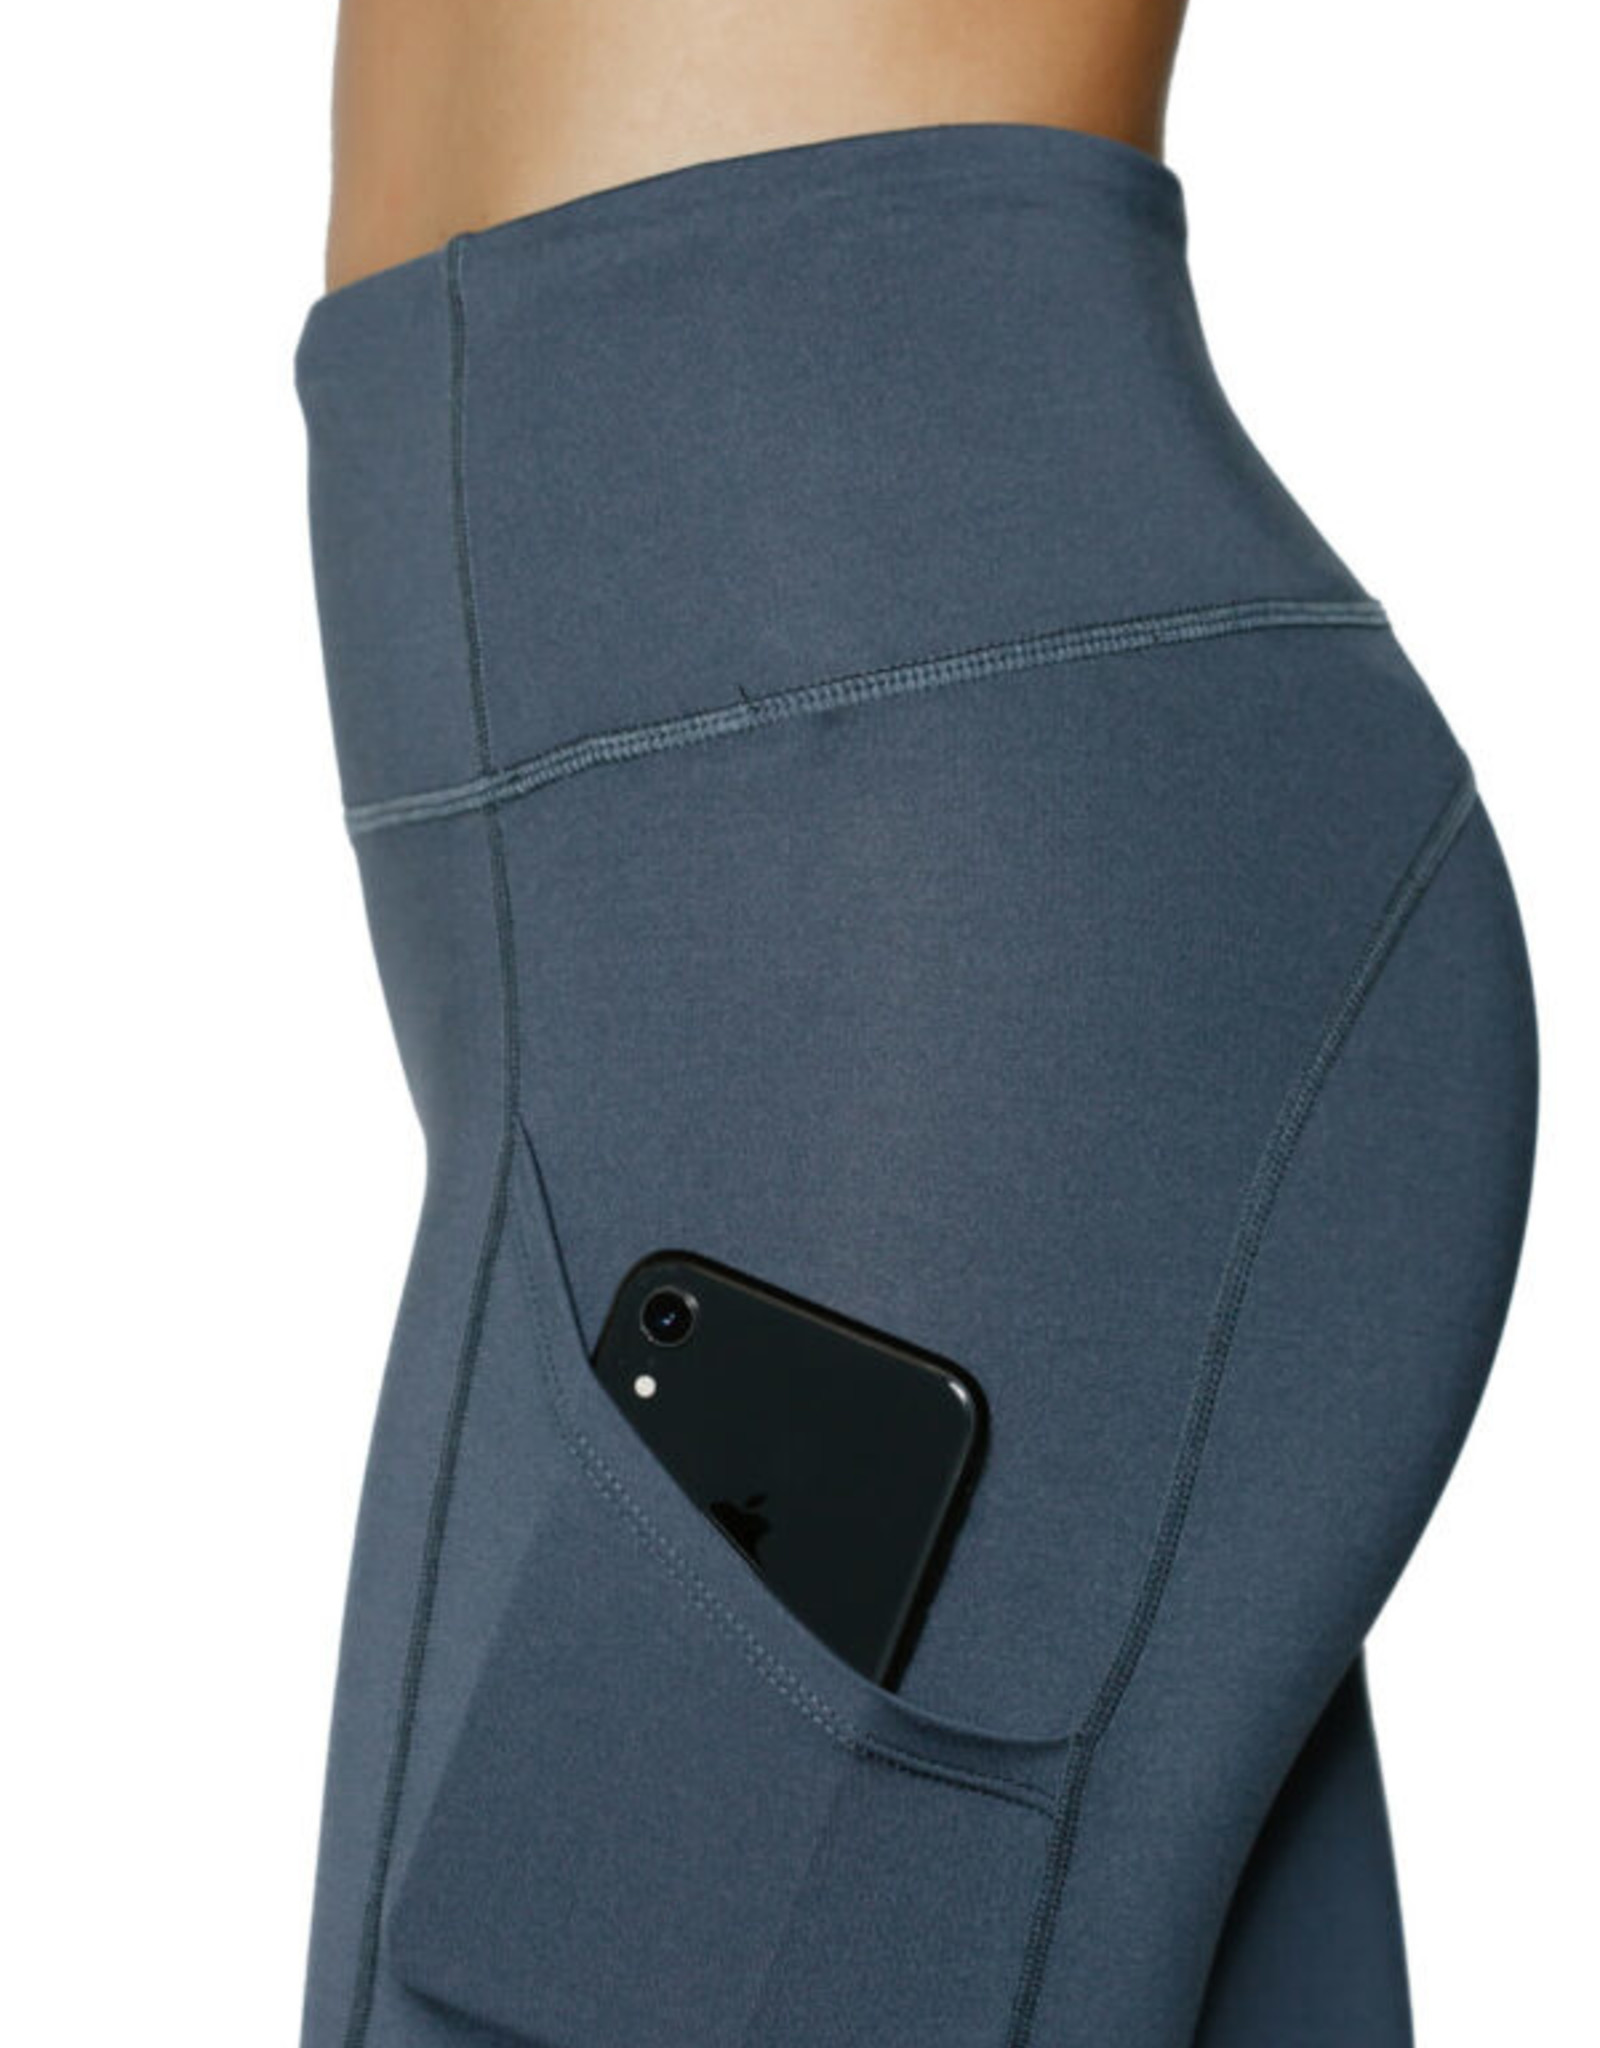 Nominou Full length leggings with pockets